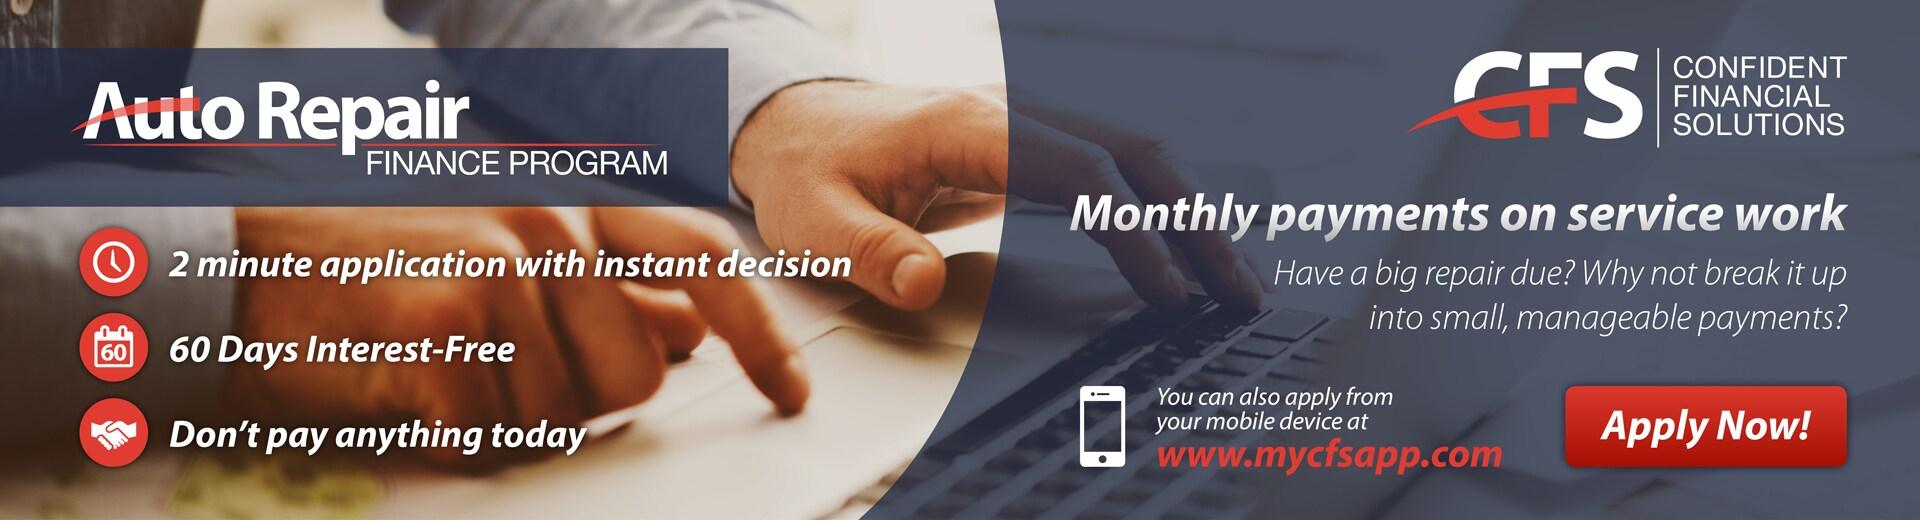 Auto Repair Finance Application